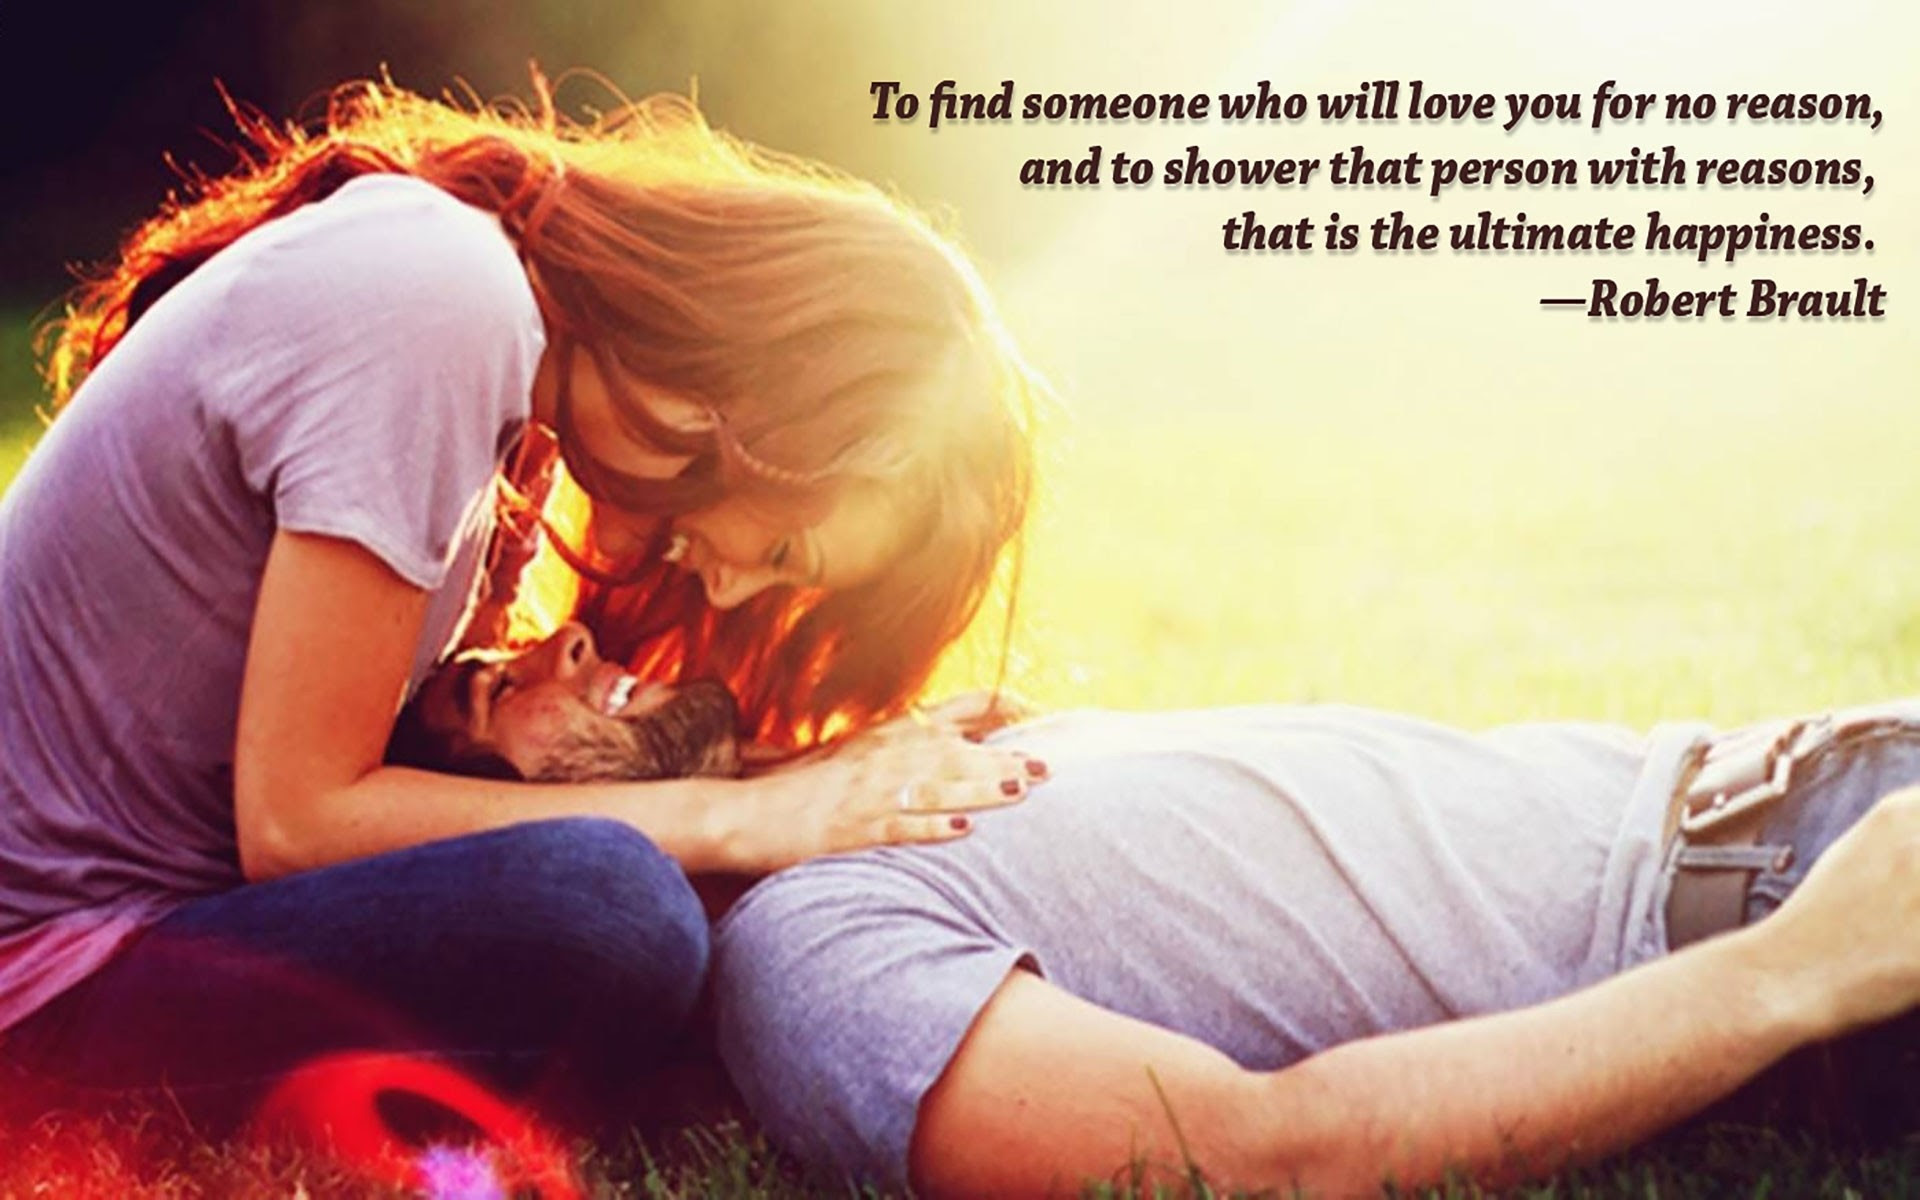 41 Koleksi Romantic Couple Wallpaper With Quotes Gratis Terbaik